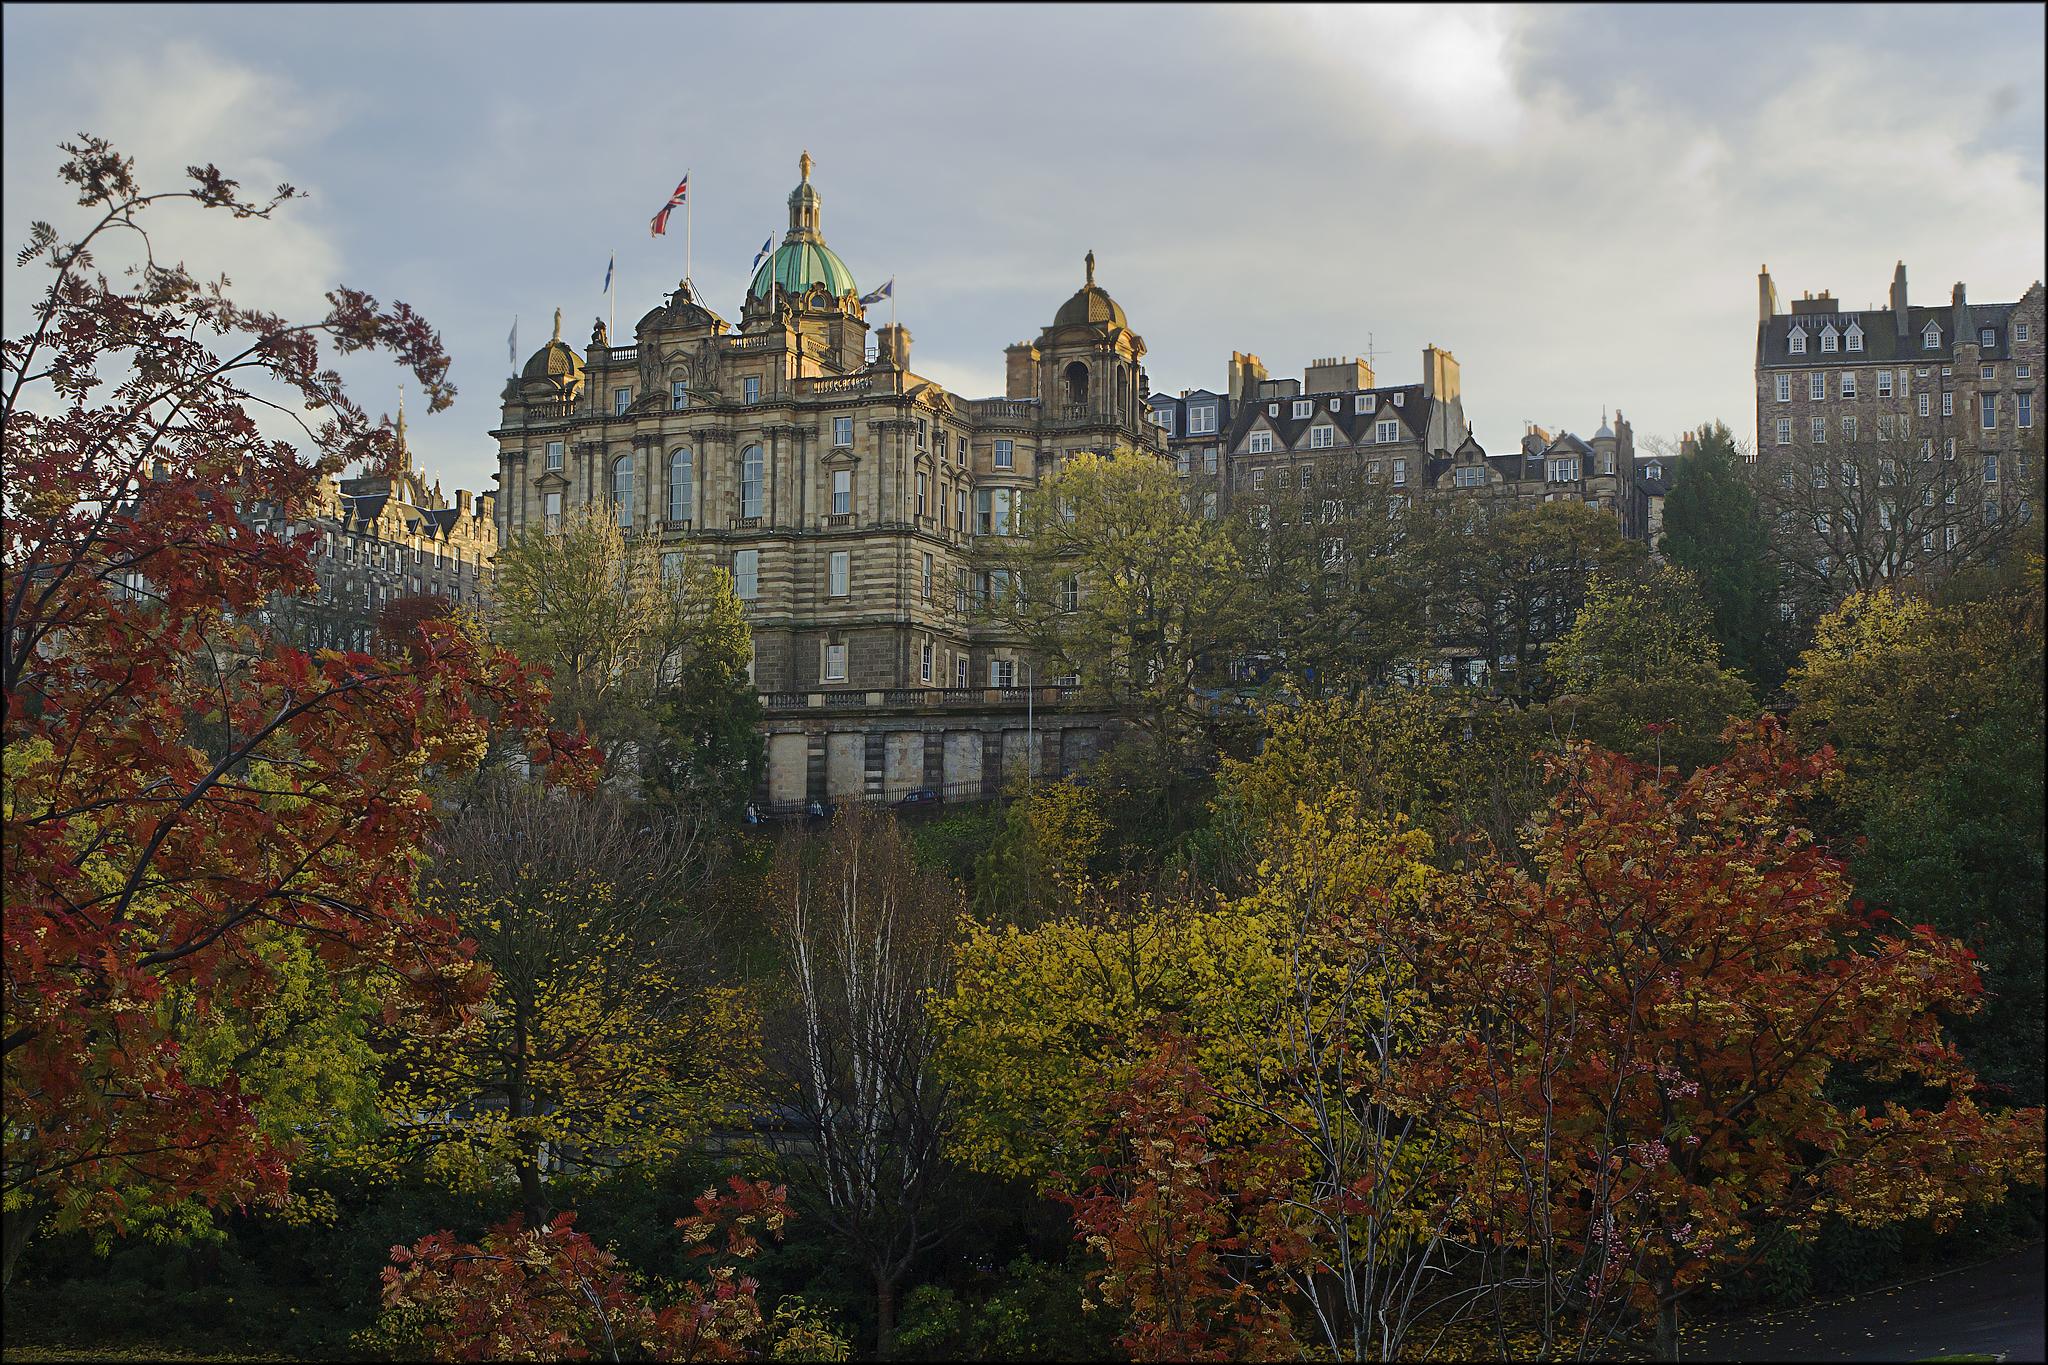 File:Princes Street Gardens, Edinburgh (10292604905).jpg - Wikimedia ...